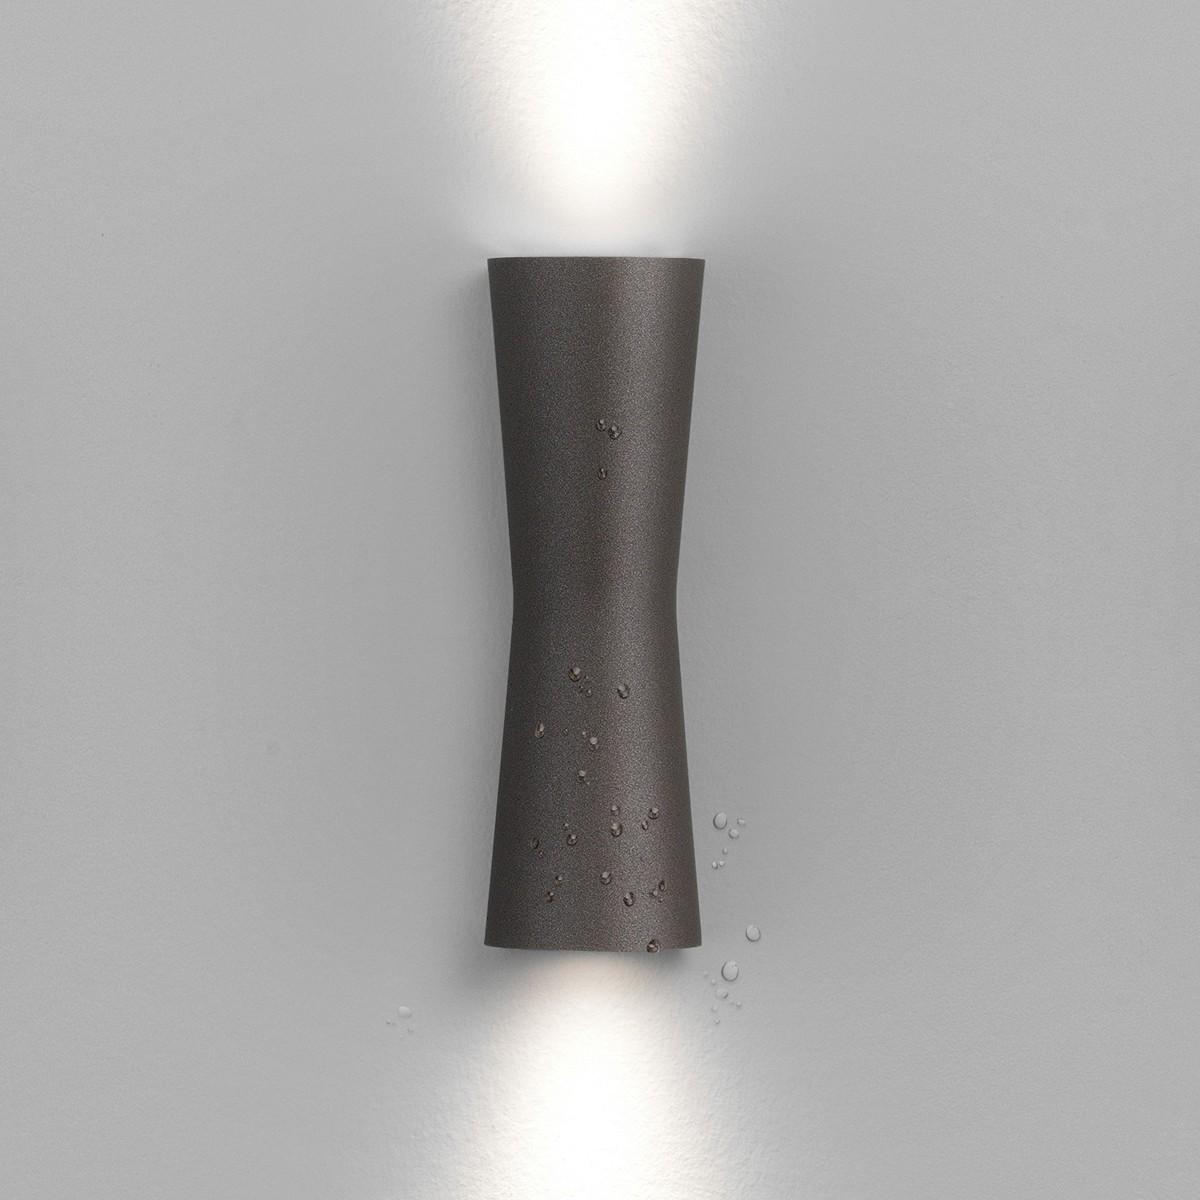 Flos Clessidra LED Outdoor Wandleuchte, Abstrahlwinkel: 20°+20°, deep brown